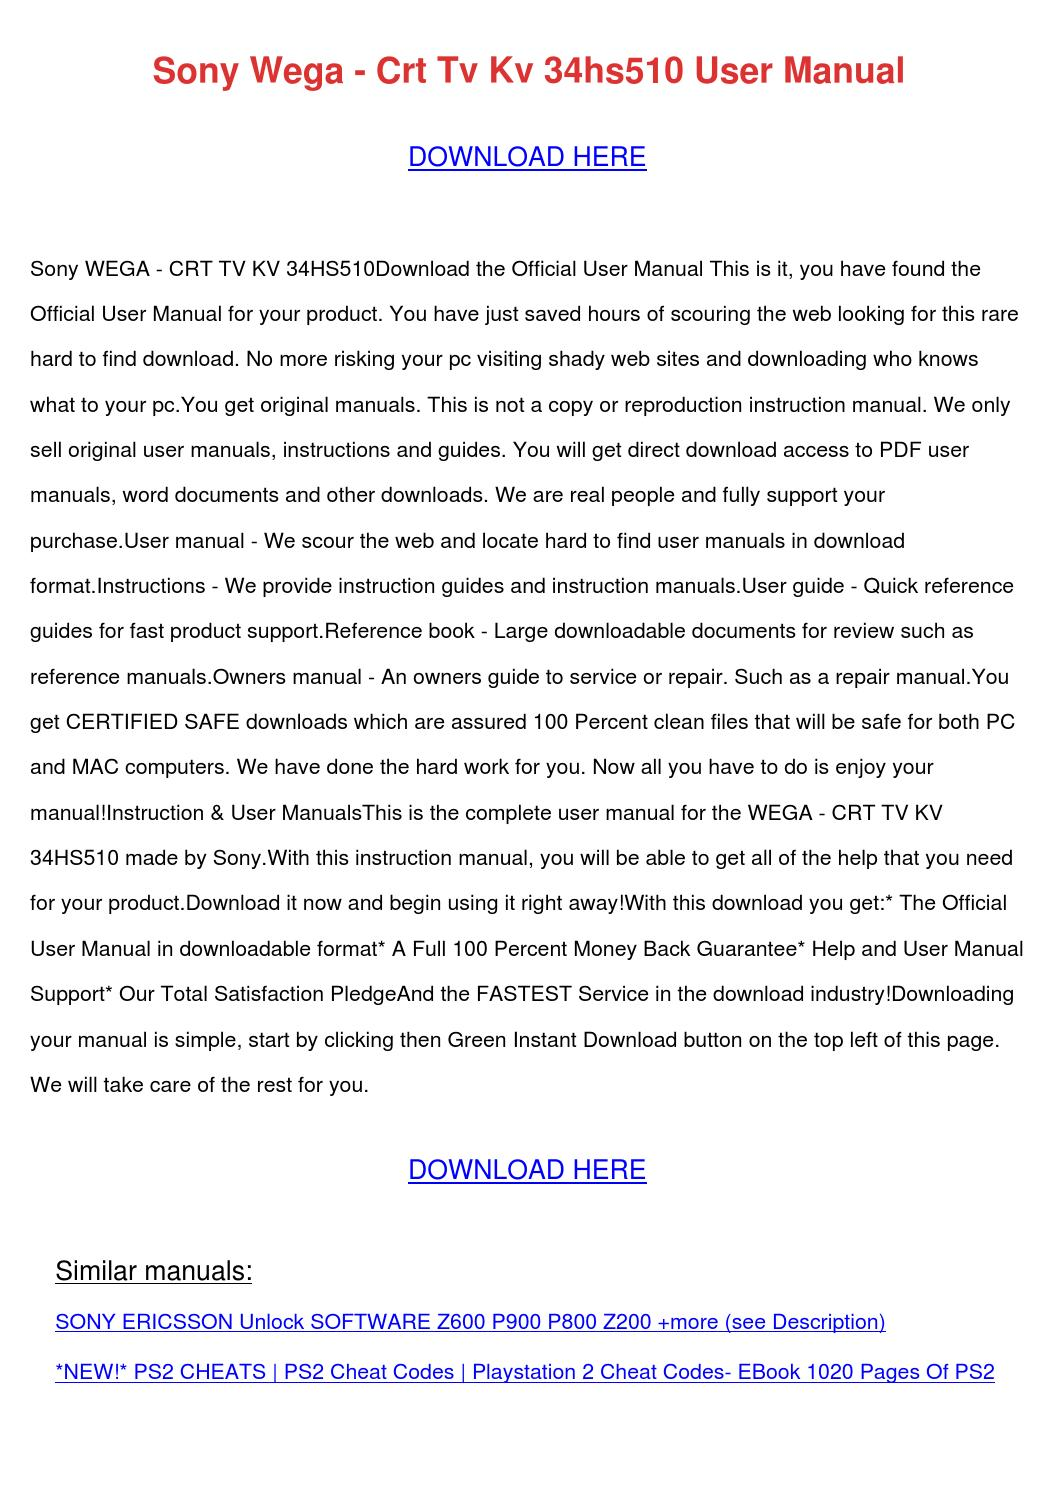 Sony Wega Crt Tv Kv 34hs510 User Manual by GeriFong - issuu